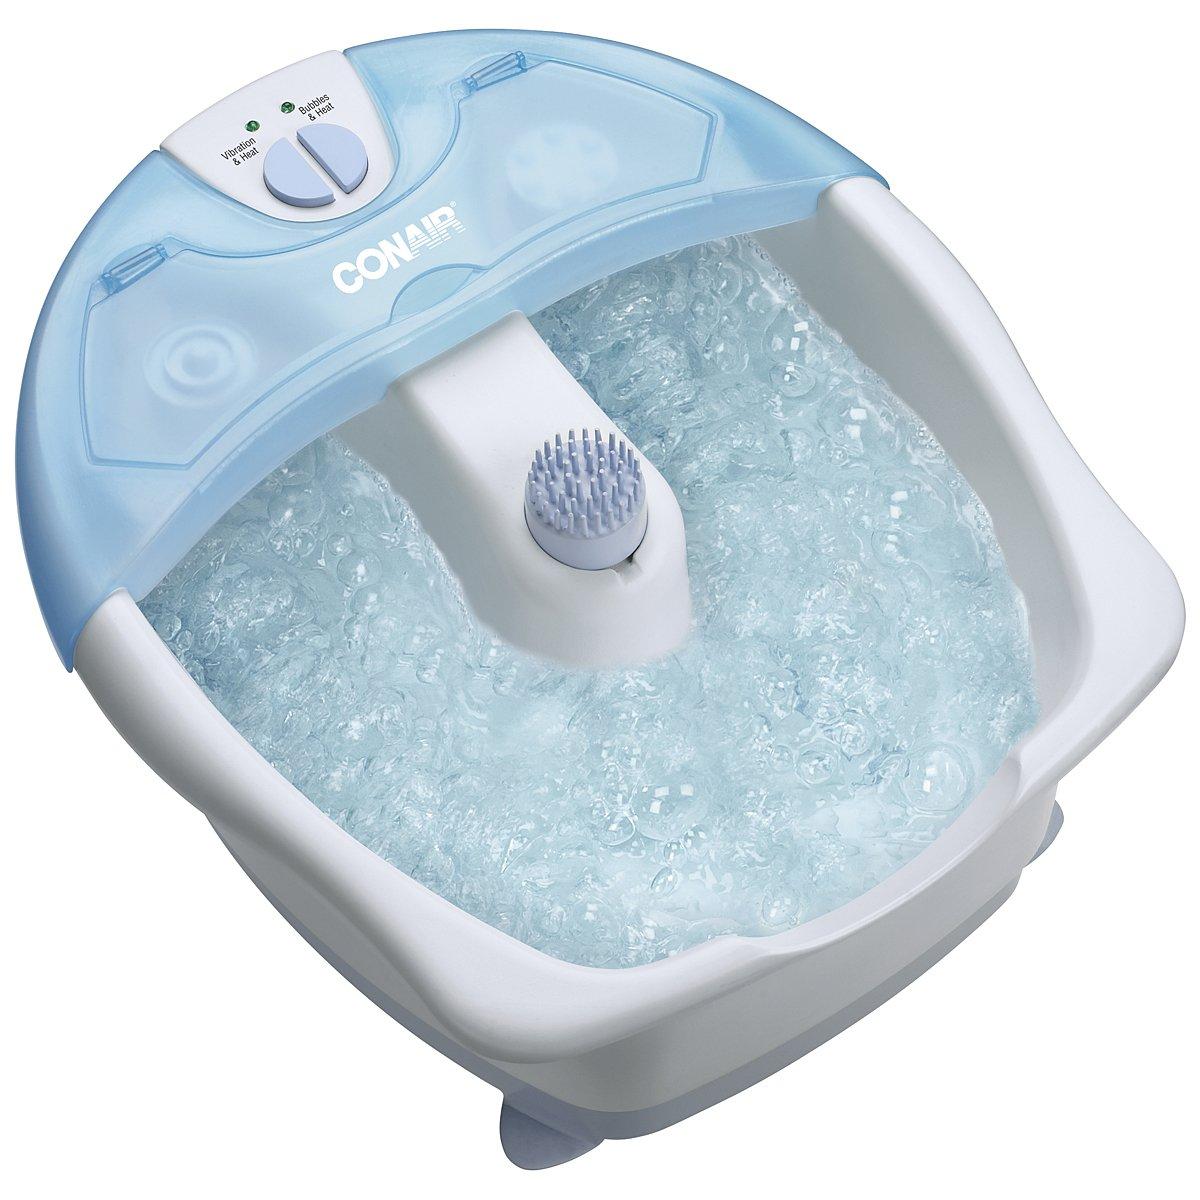 Conair FB5TC Whirlpool Massaging Foot Bath (White): Amazon.ca ...